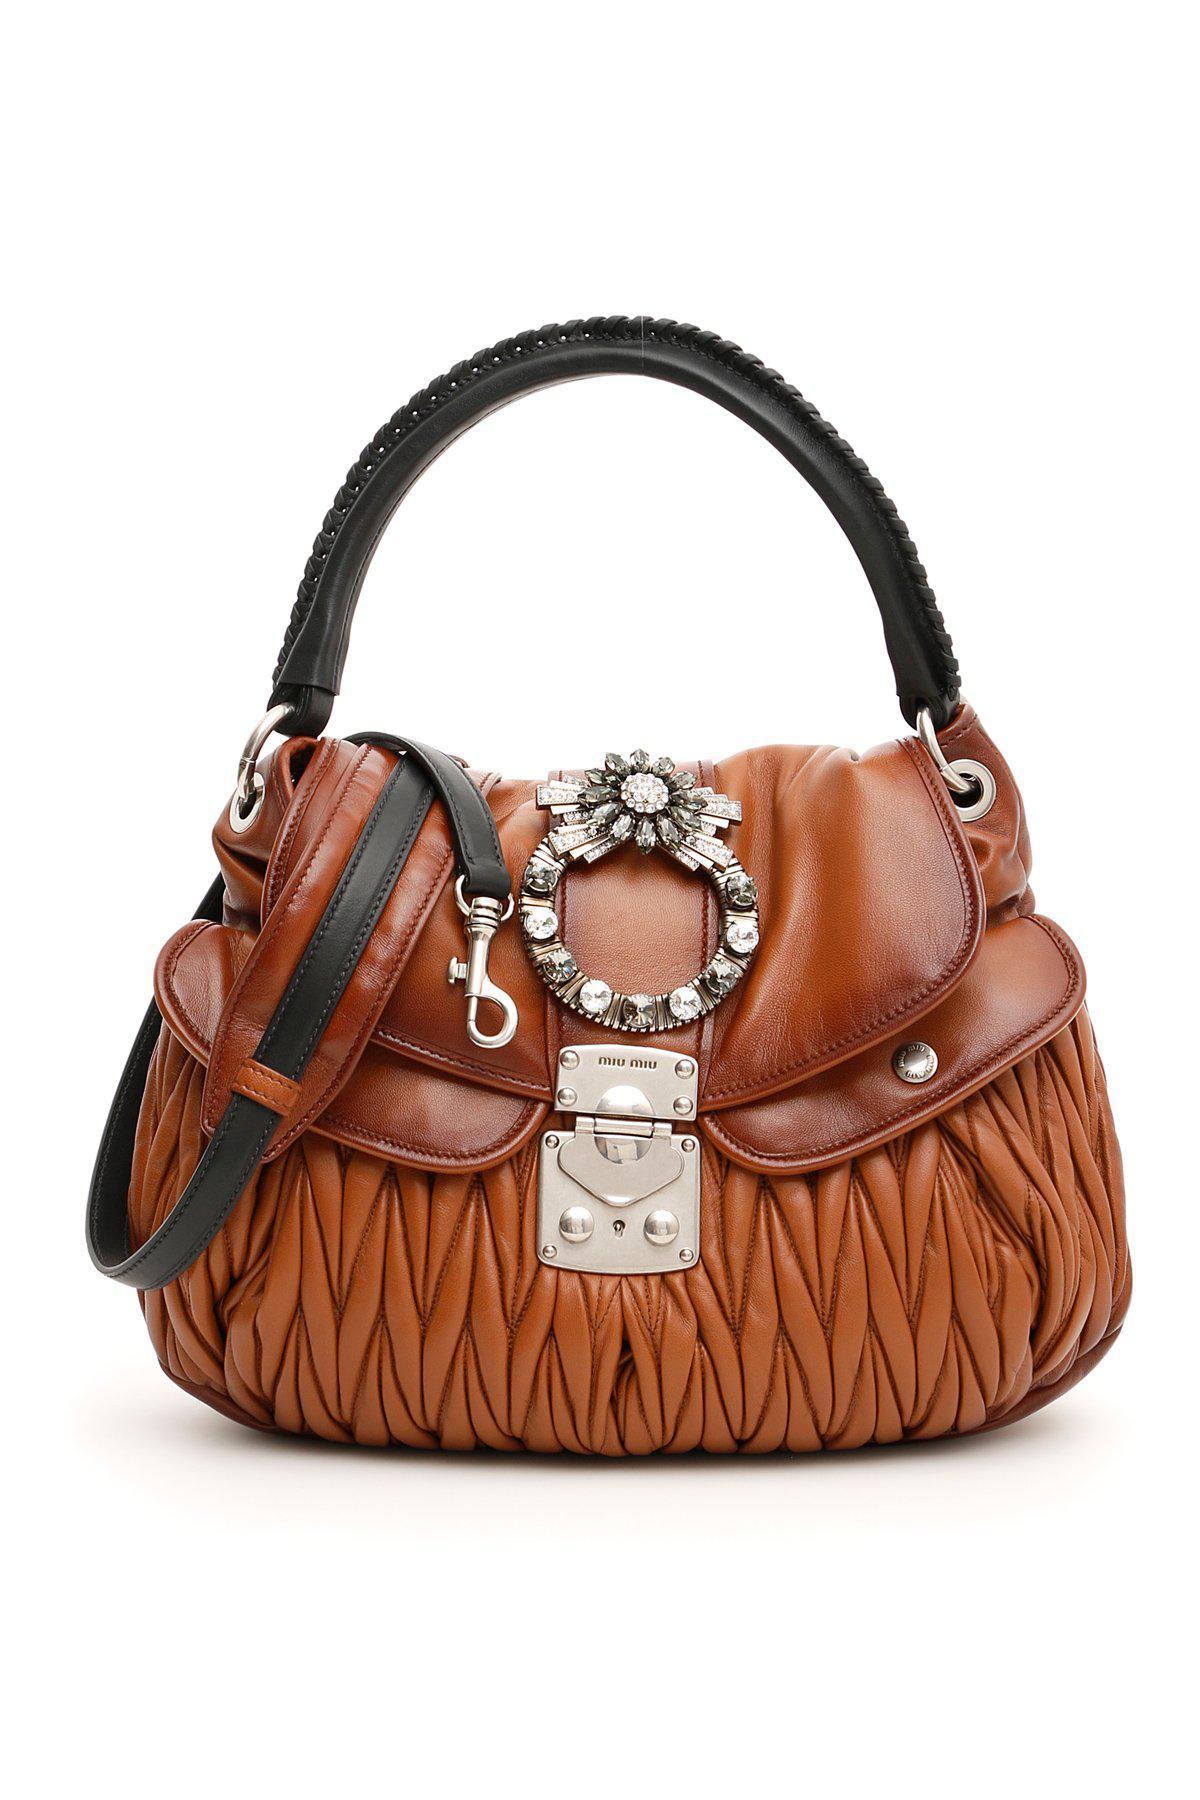 3aaa61b9535a Miu Miu Crystal Buckle Coffer Bag in Brown - Lyst